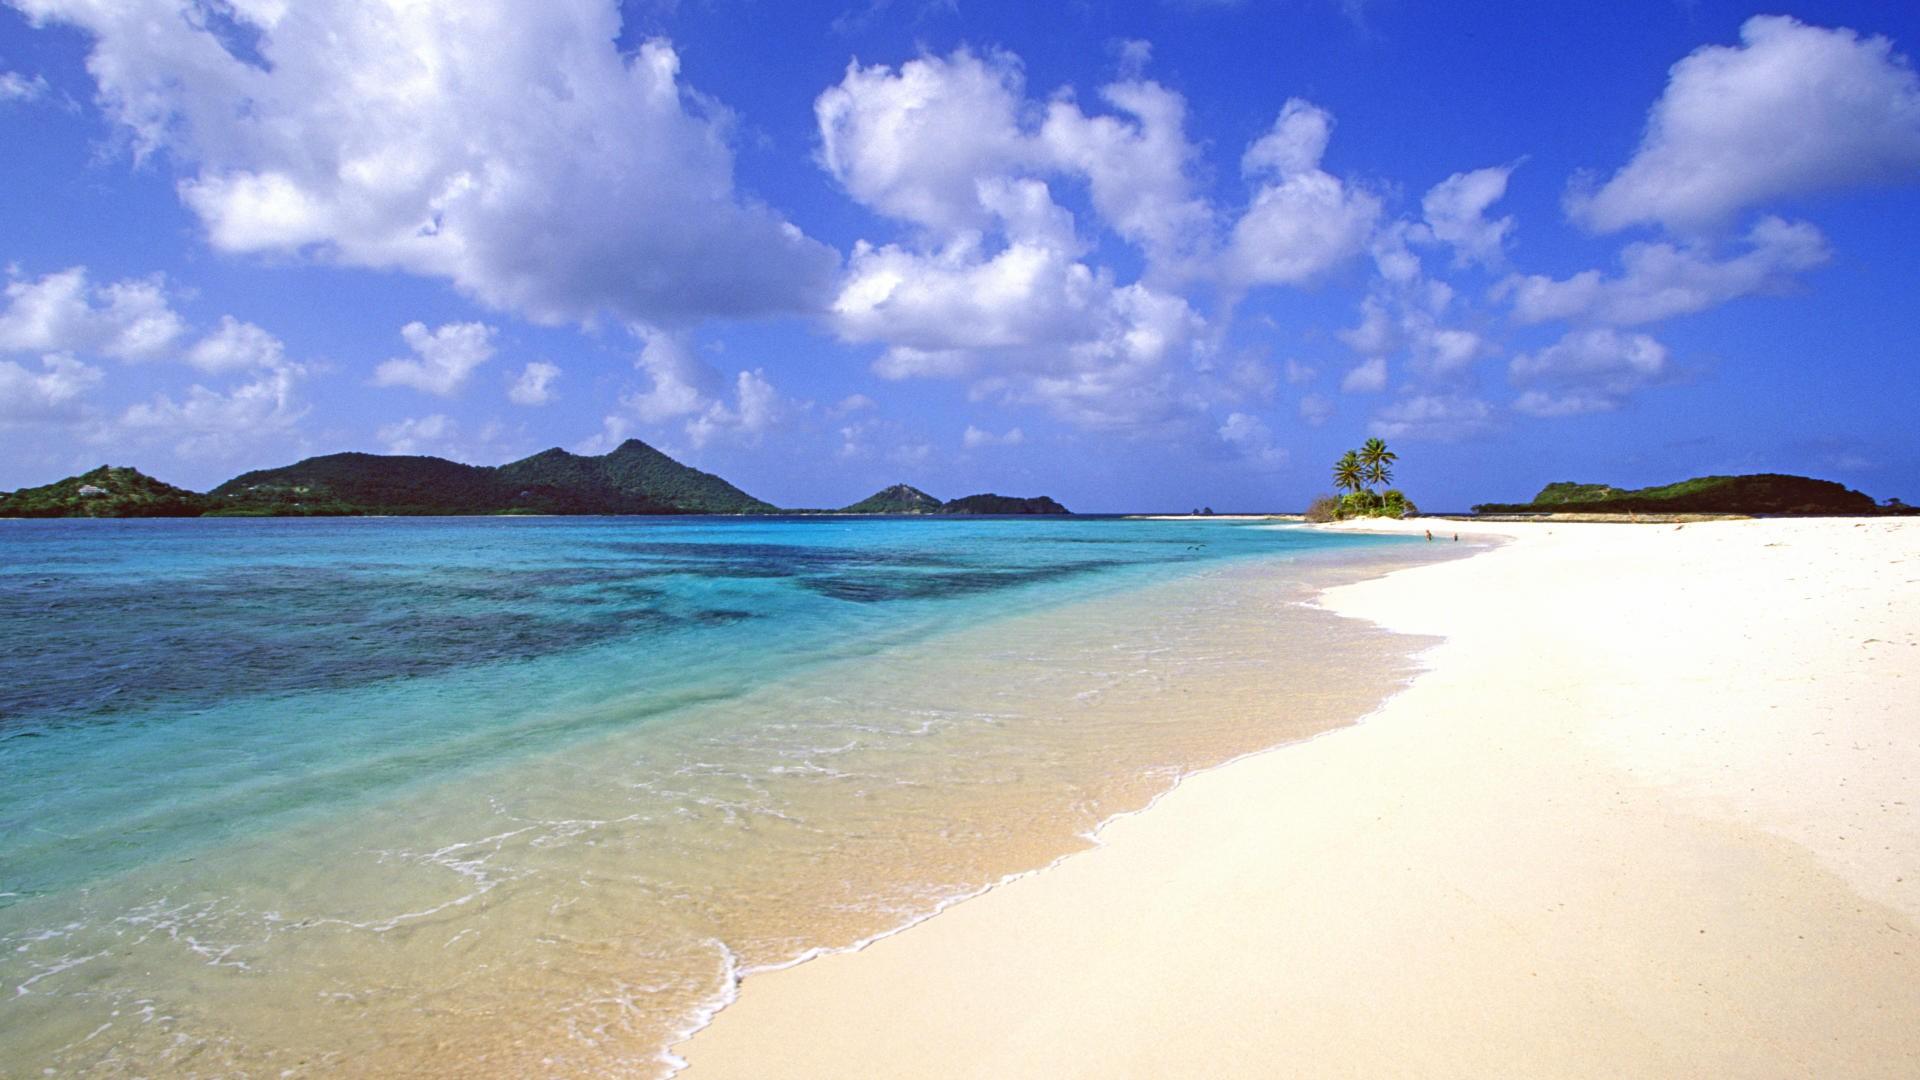 Exotic Beach wallpaper   689680 1920x1080